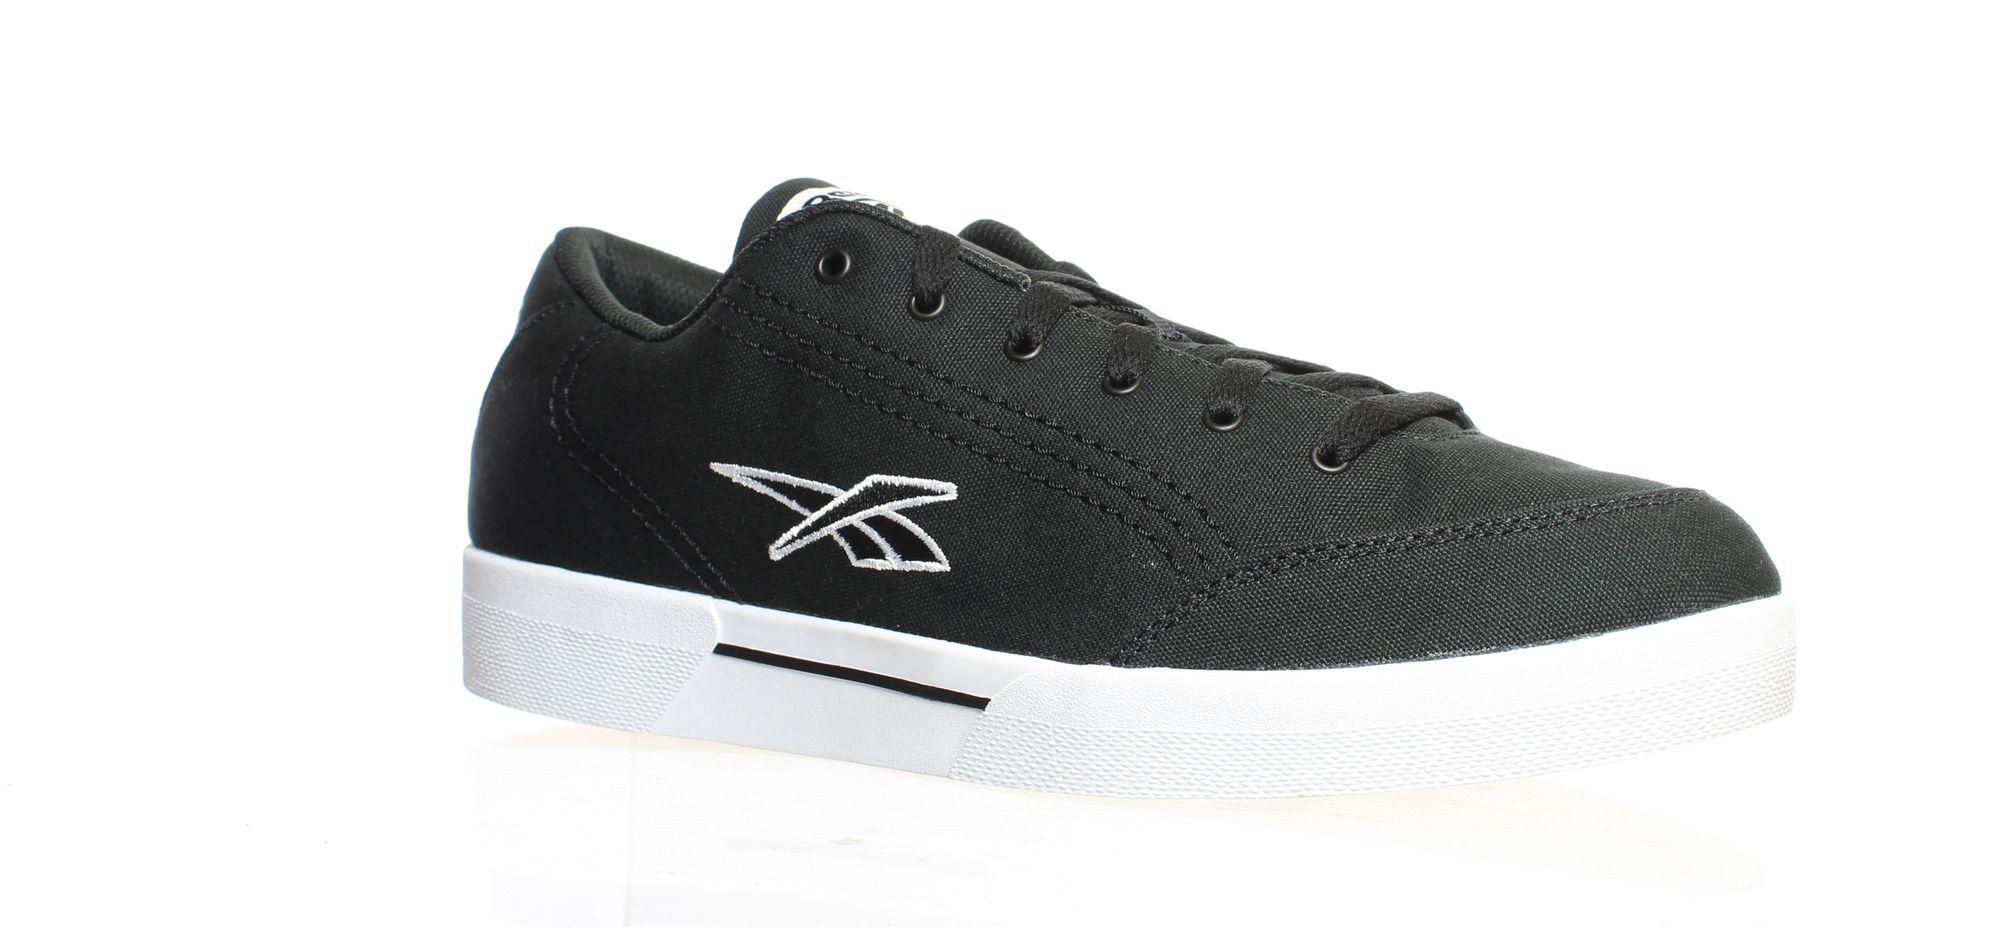 Reebok Mens Slice Cvs Black-white-gum Tennis Shoes Size 11